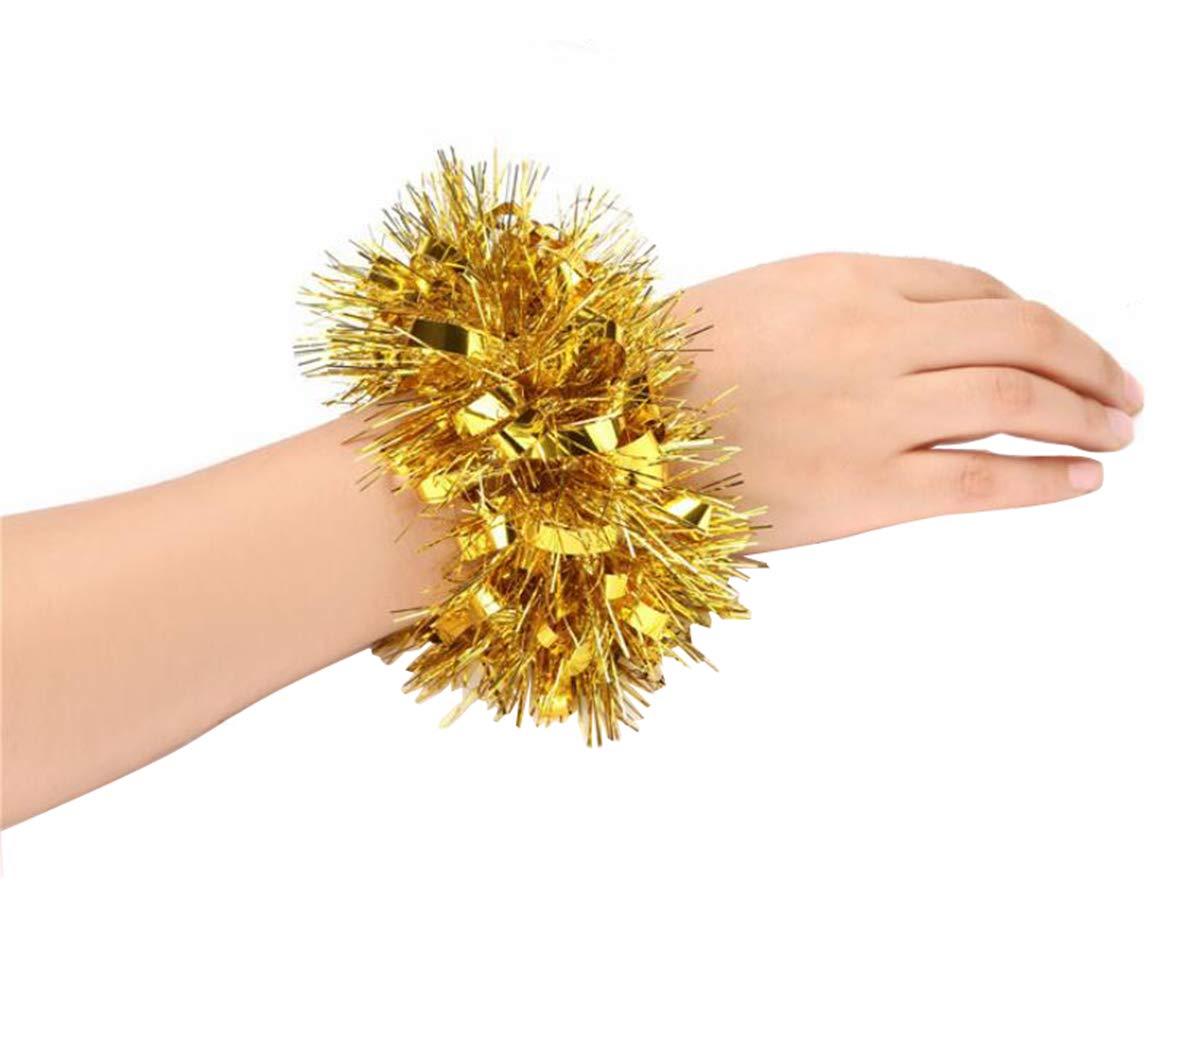 2PCS Cheerleading Cheerleader Hand Flower Wristband Sports Party Decoration Accessories Dance Pompoms Cheer Pom for Kindergarten Colleage Team Spirit Corporate Events Upstore 1Pair